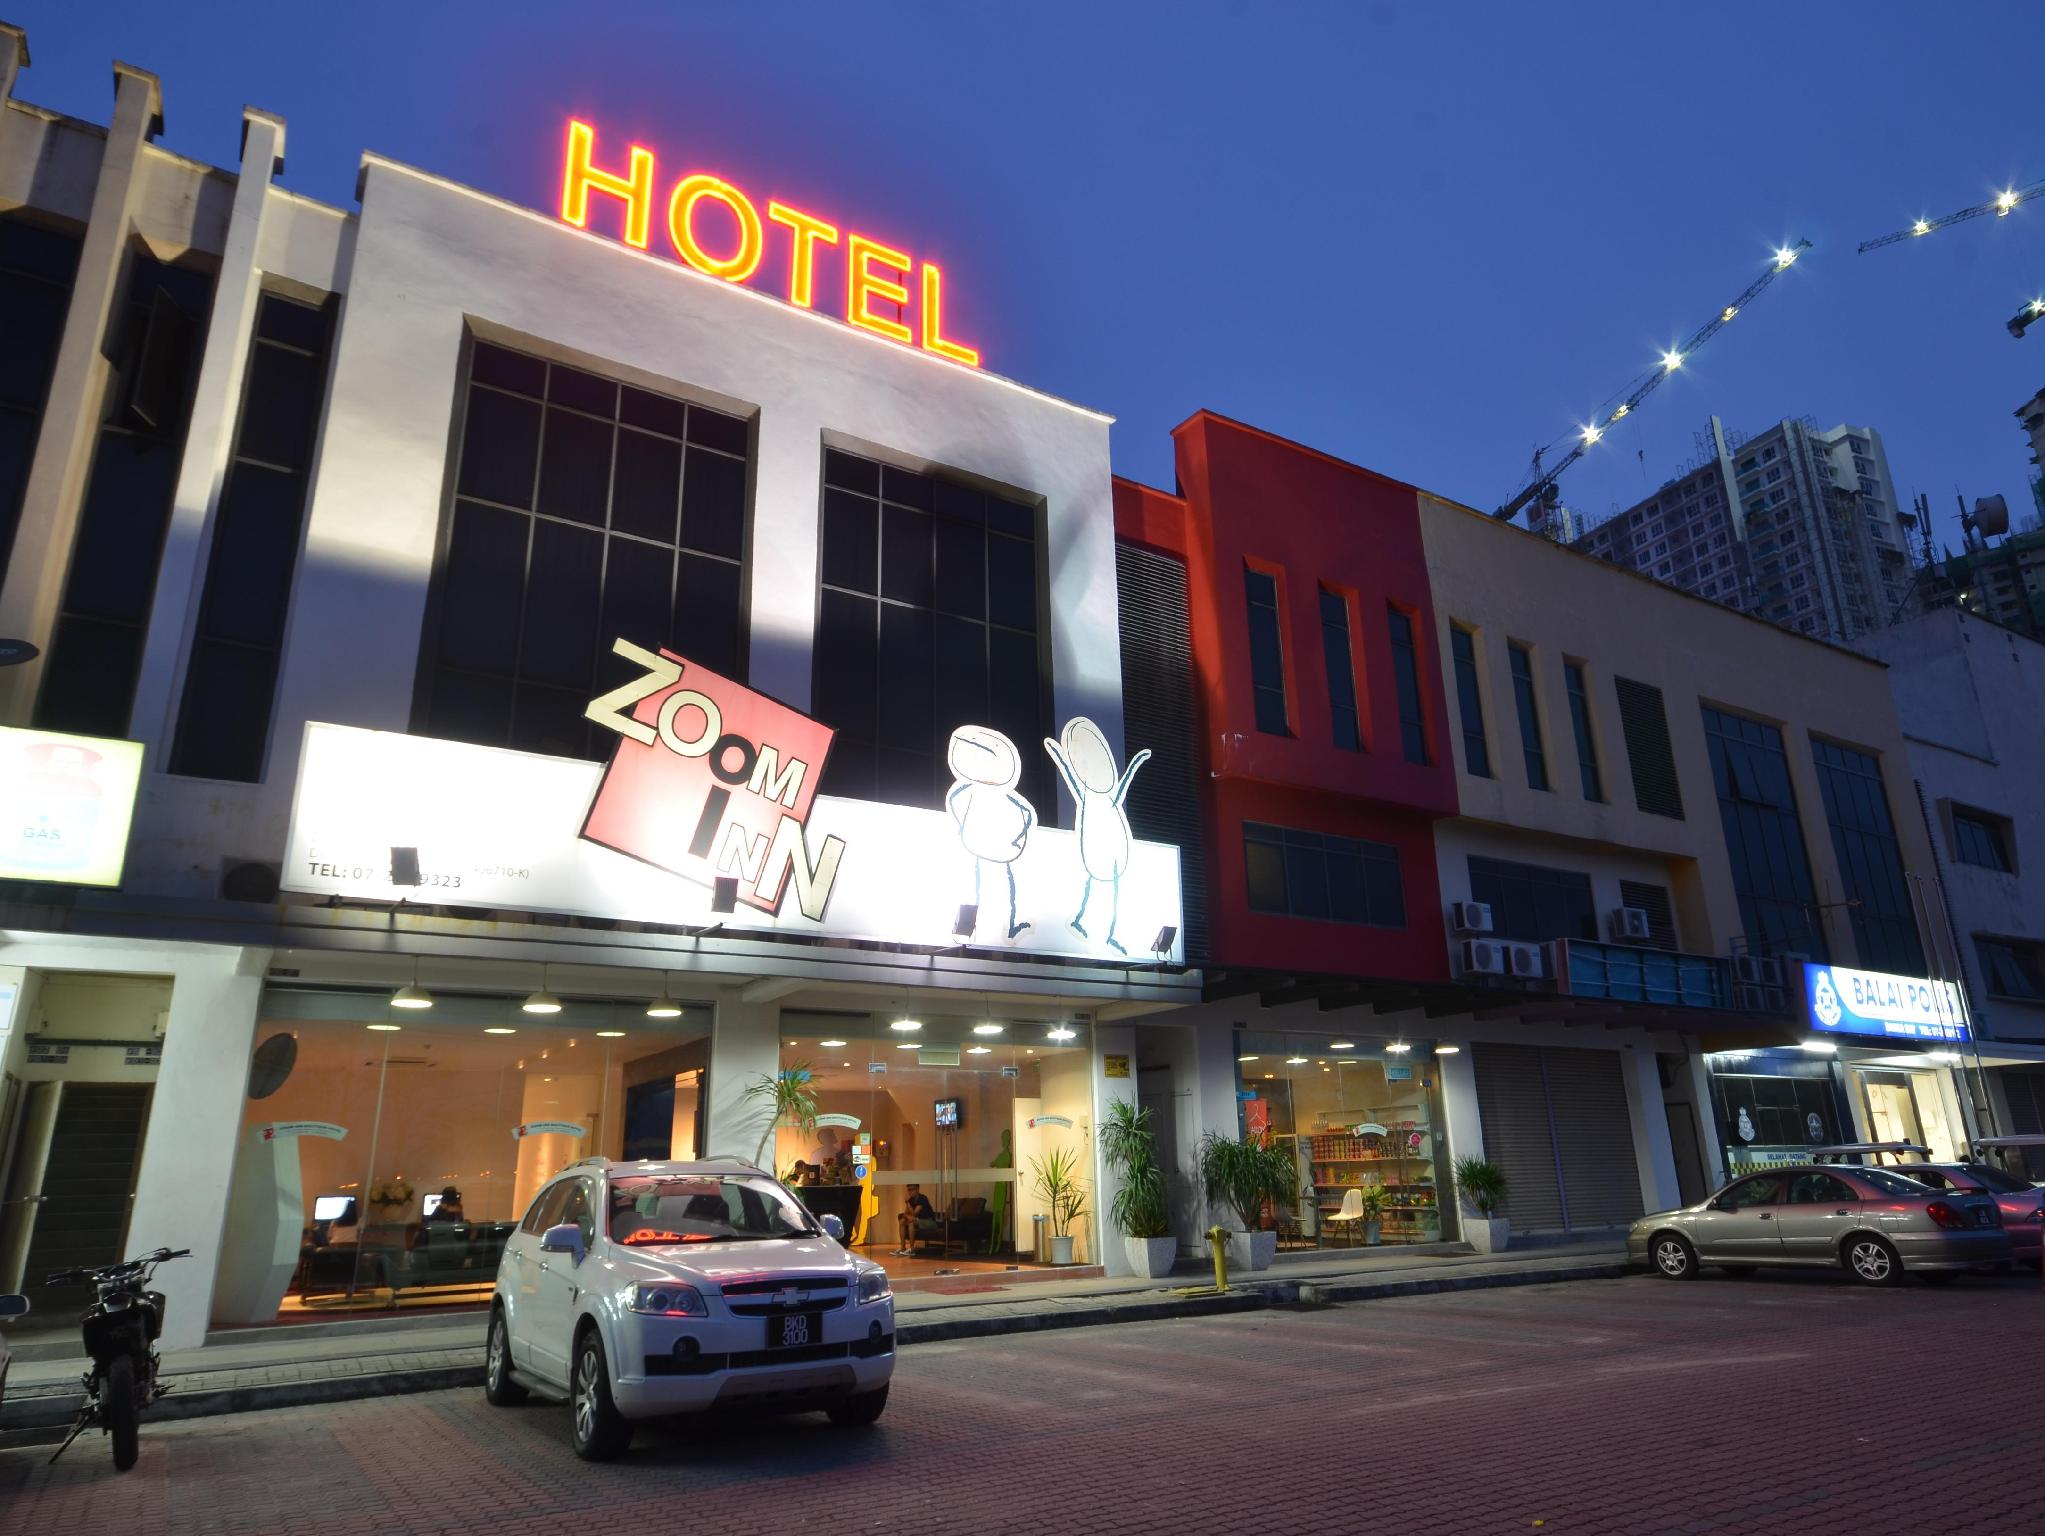 Zoom Inn Boutique Hotel   Danga Bay